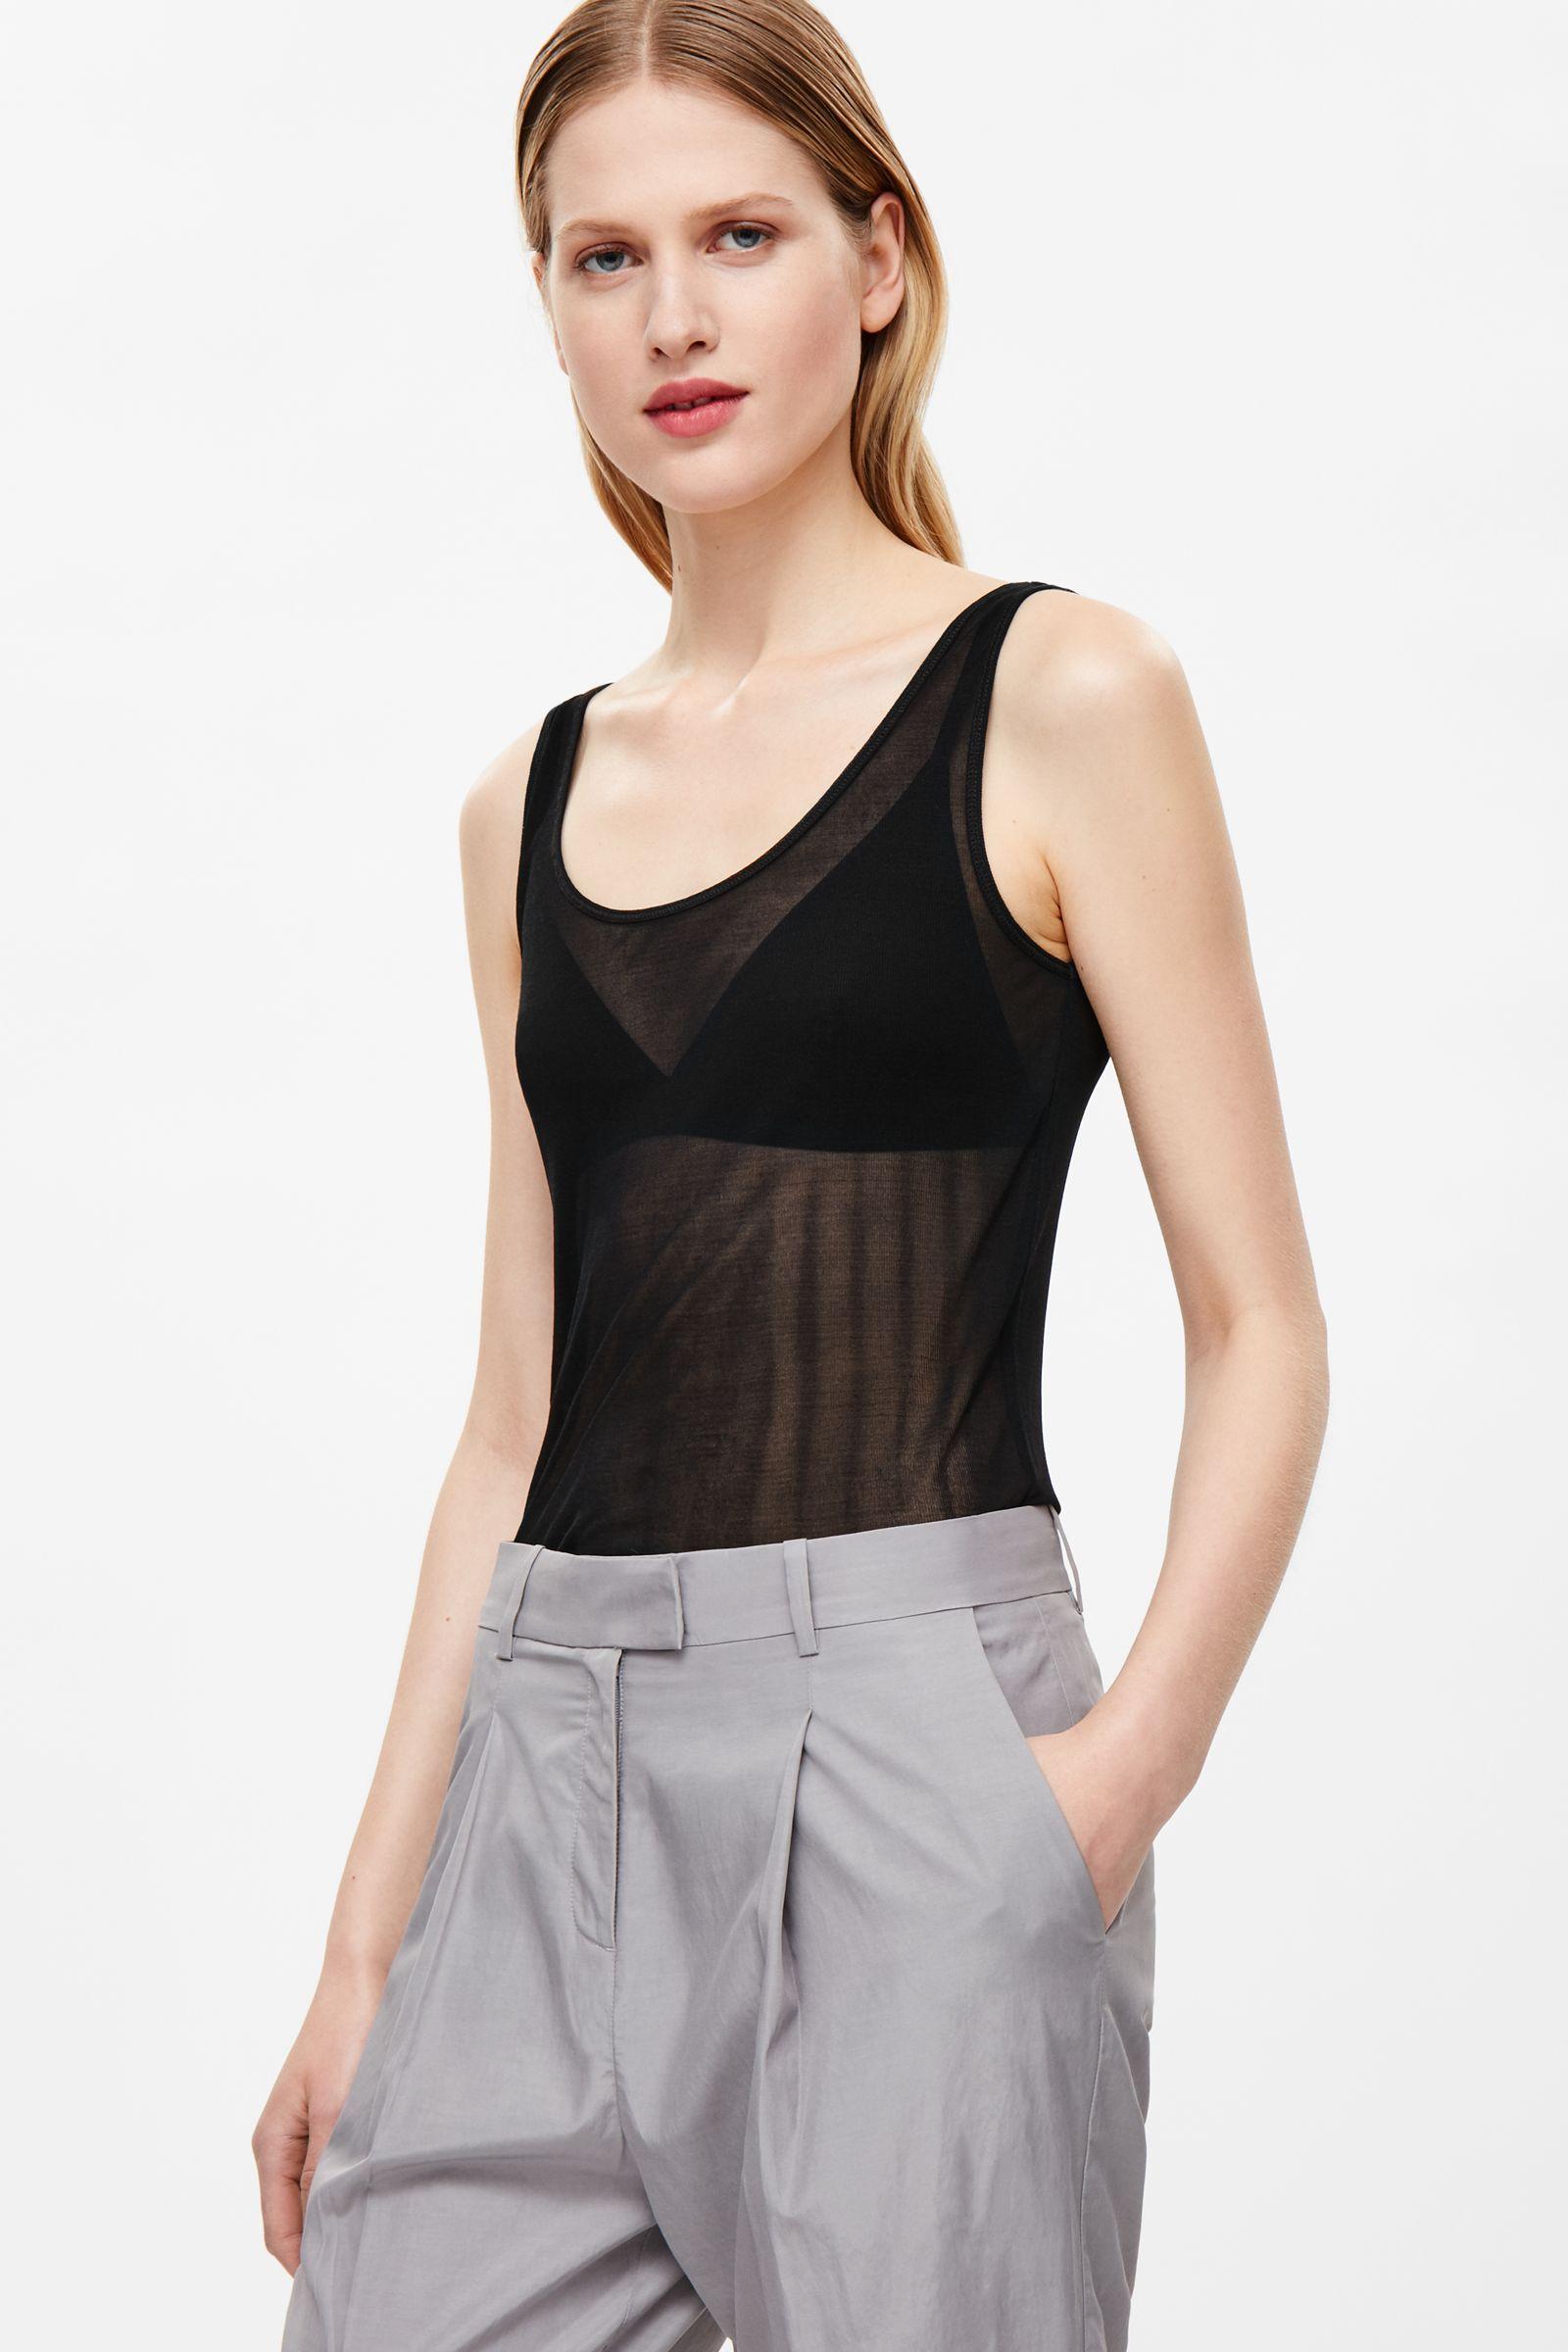 COS | Sheer silk vest top in Black